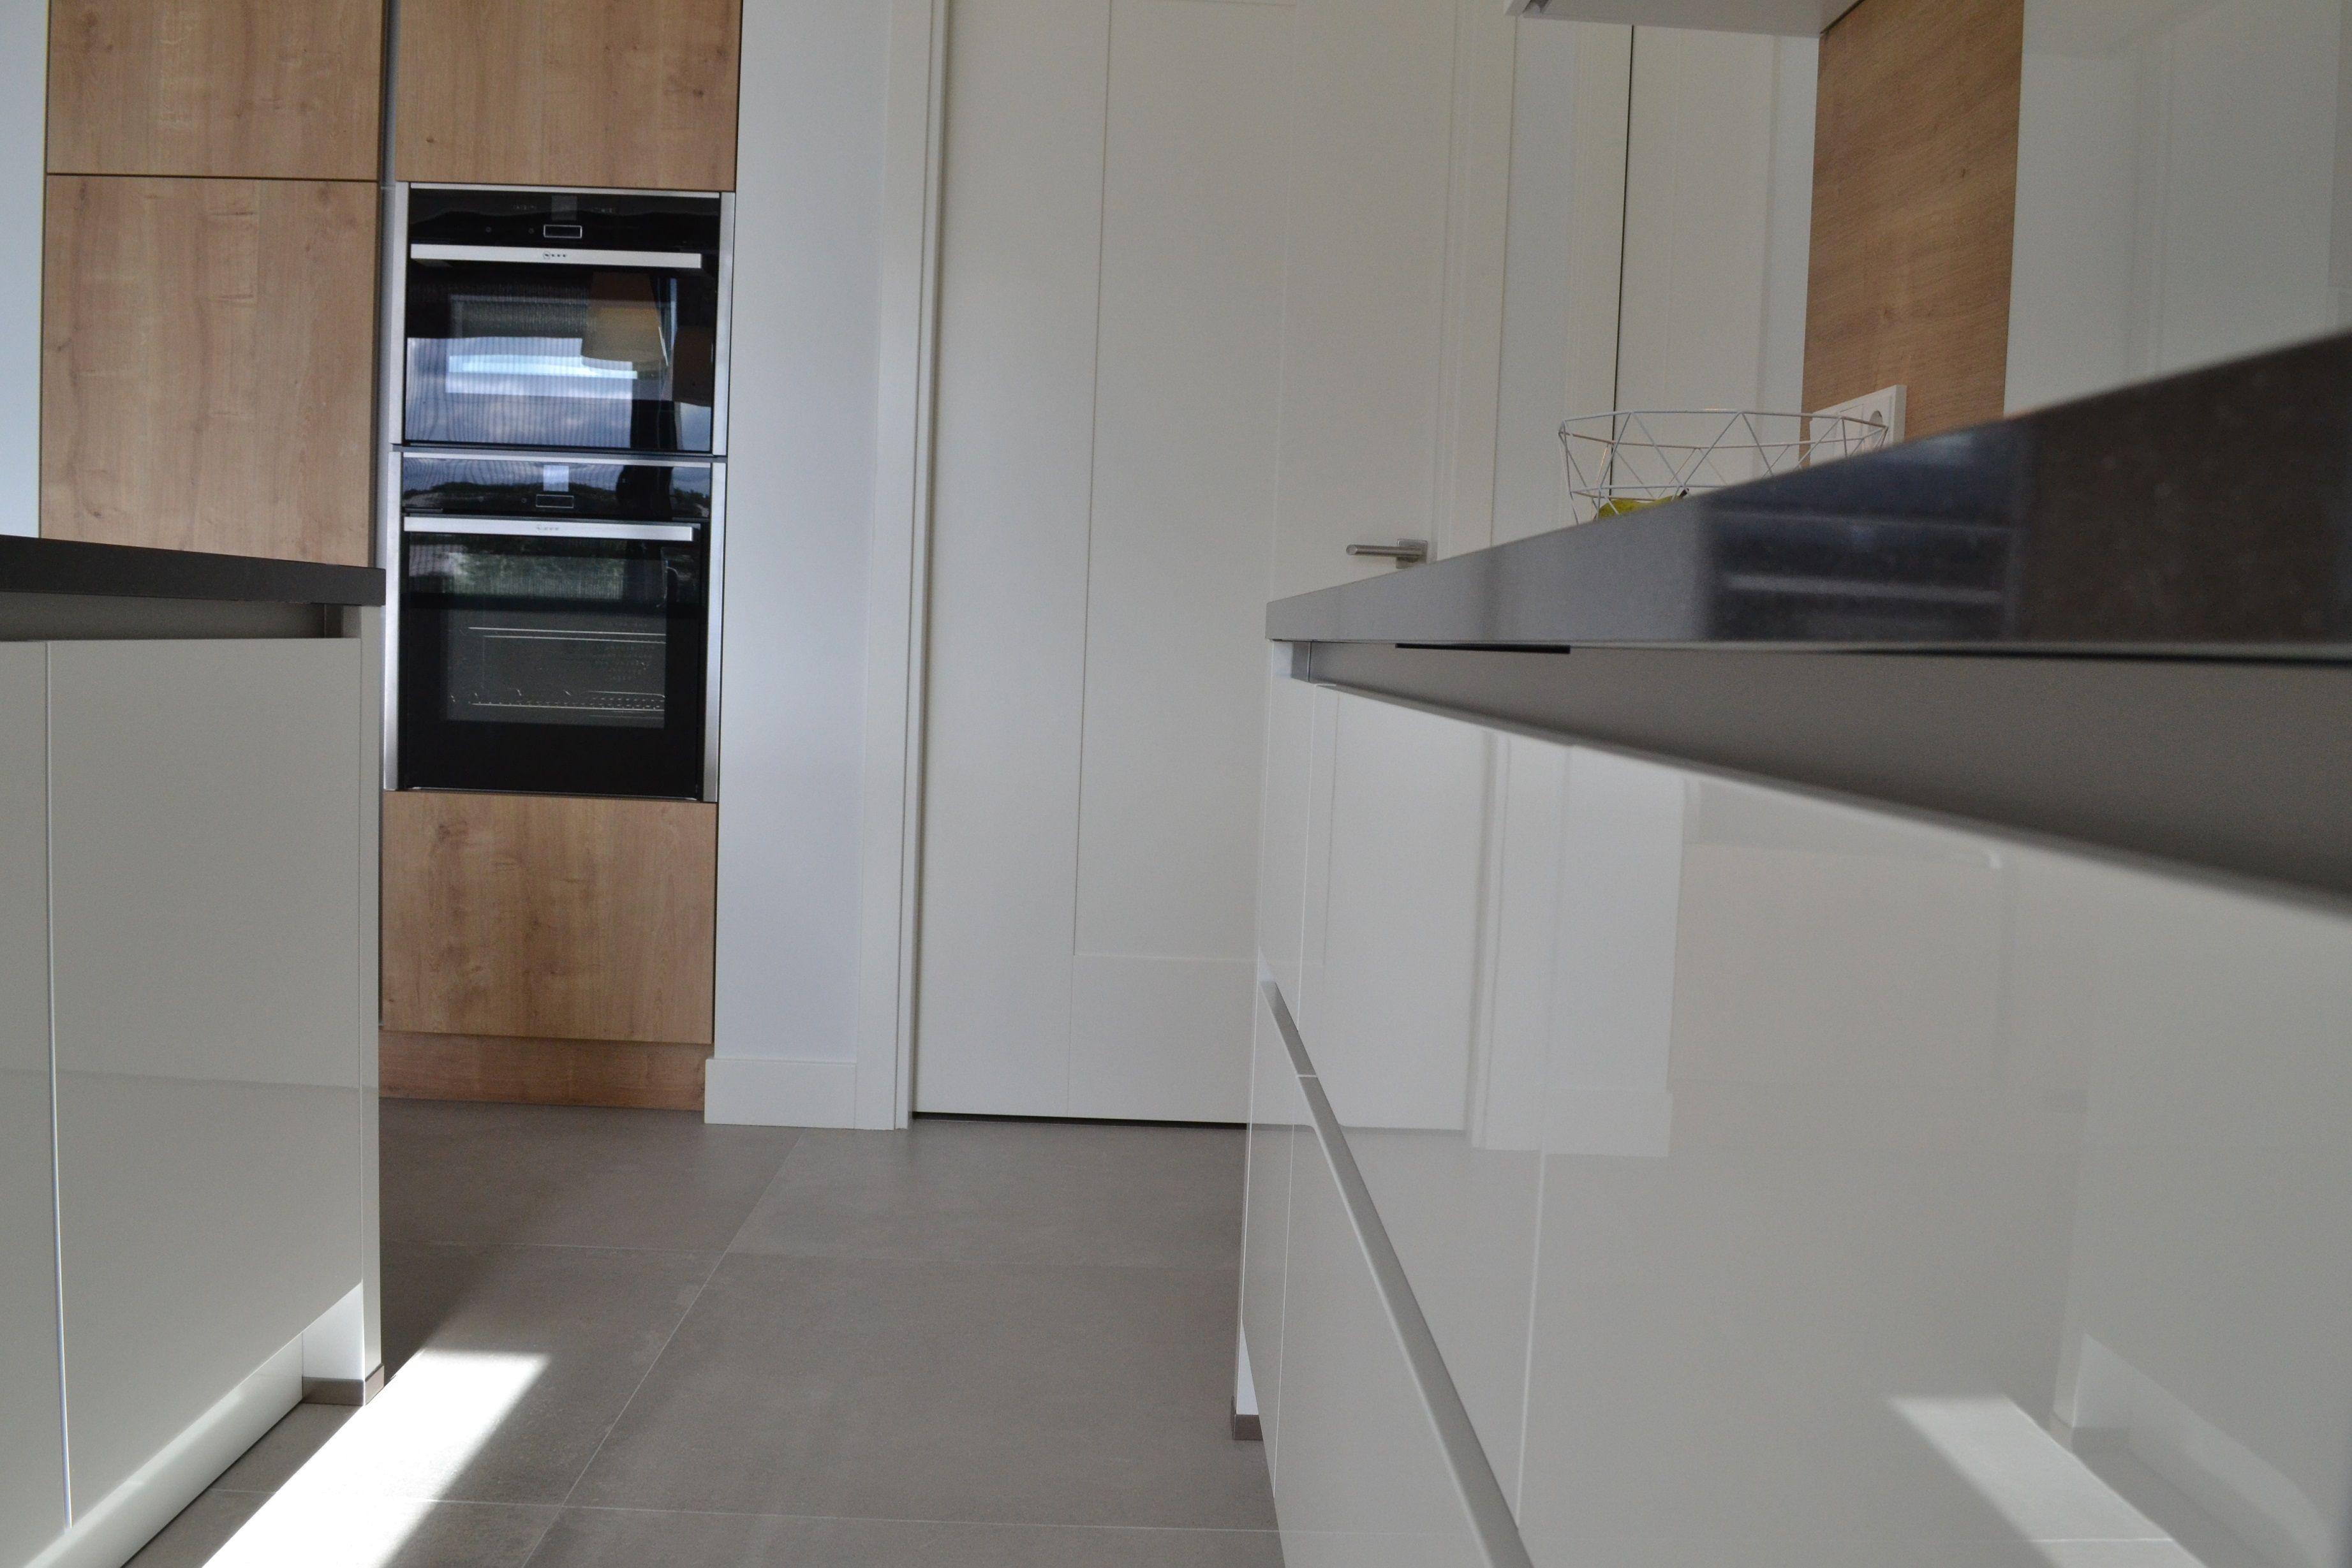 Greeploze Strak Witte Hoogglans Keuken In Combinatie Met Hout Witte Hoogglans Keuken Keuken Witte Keuken